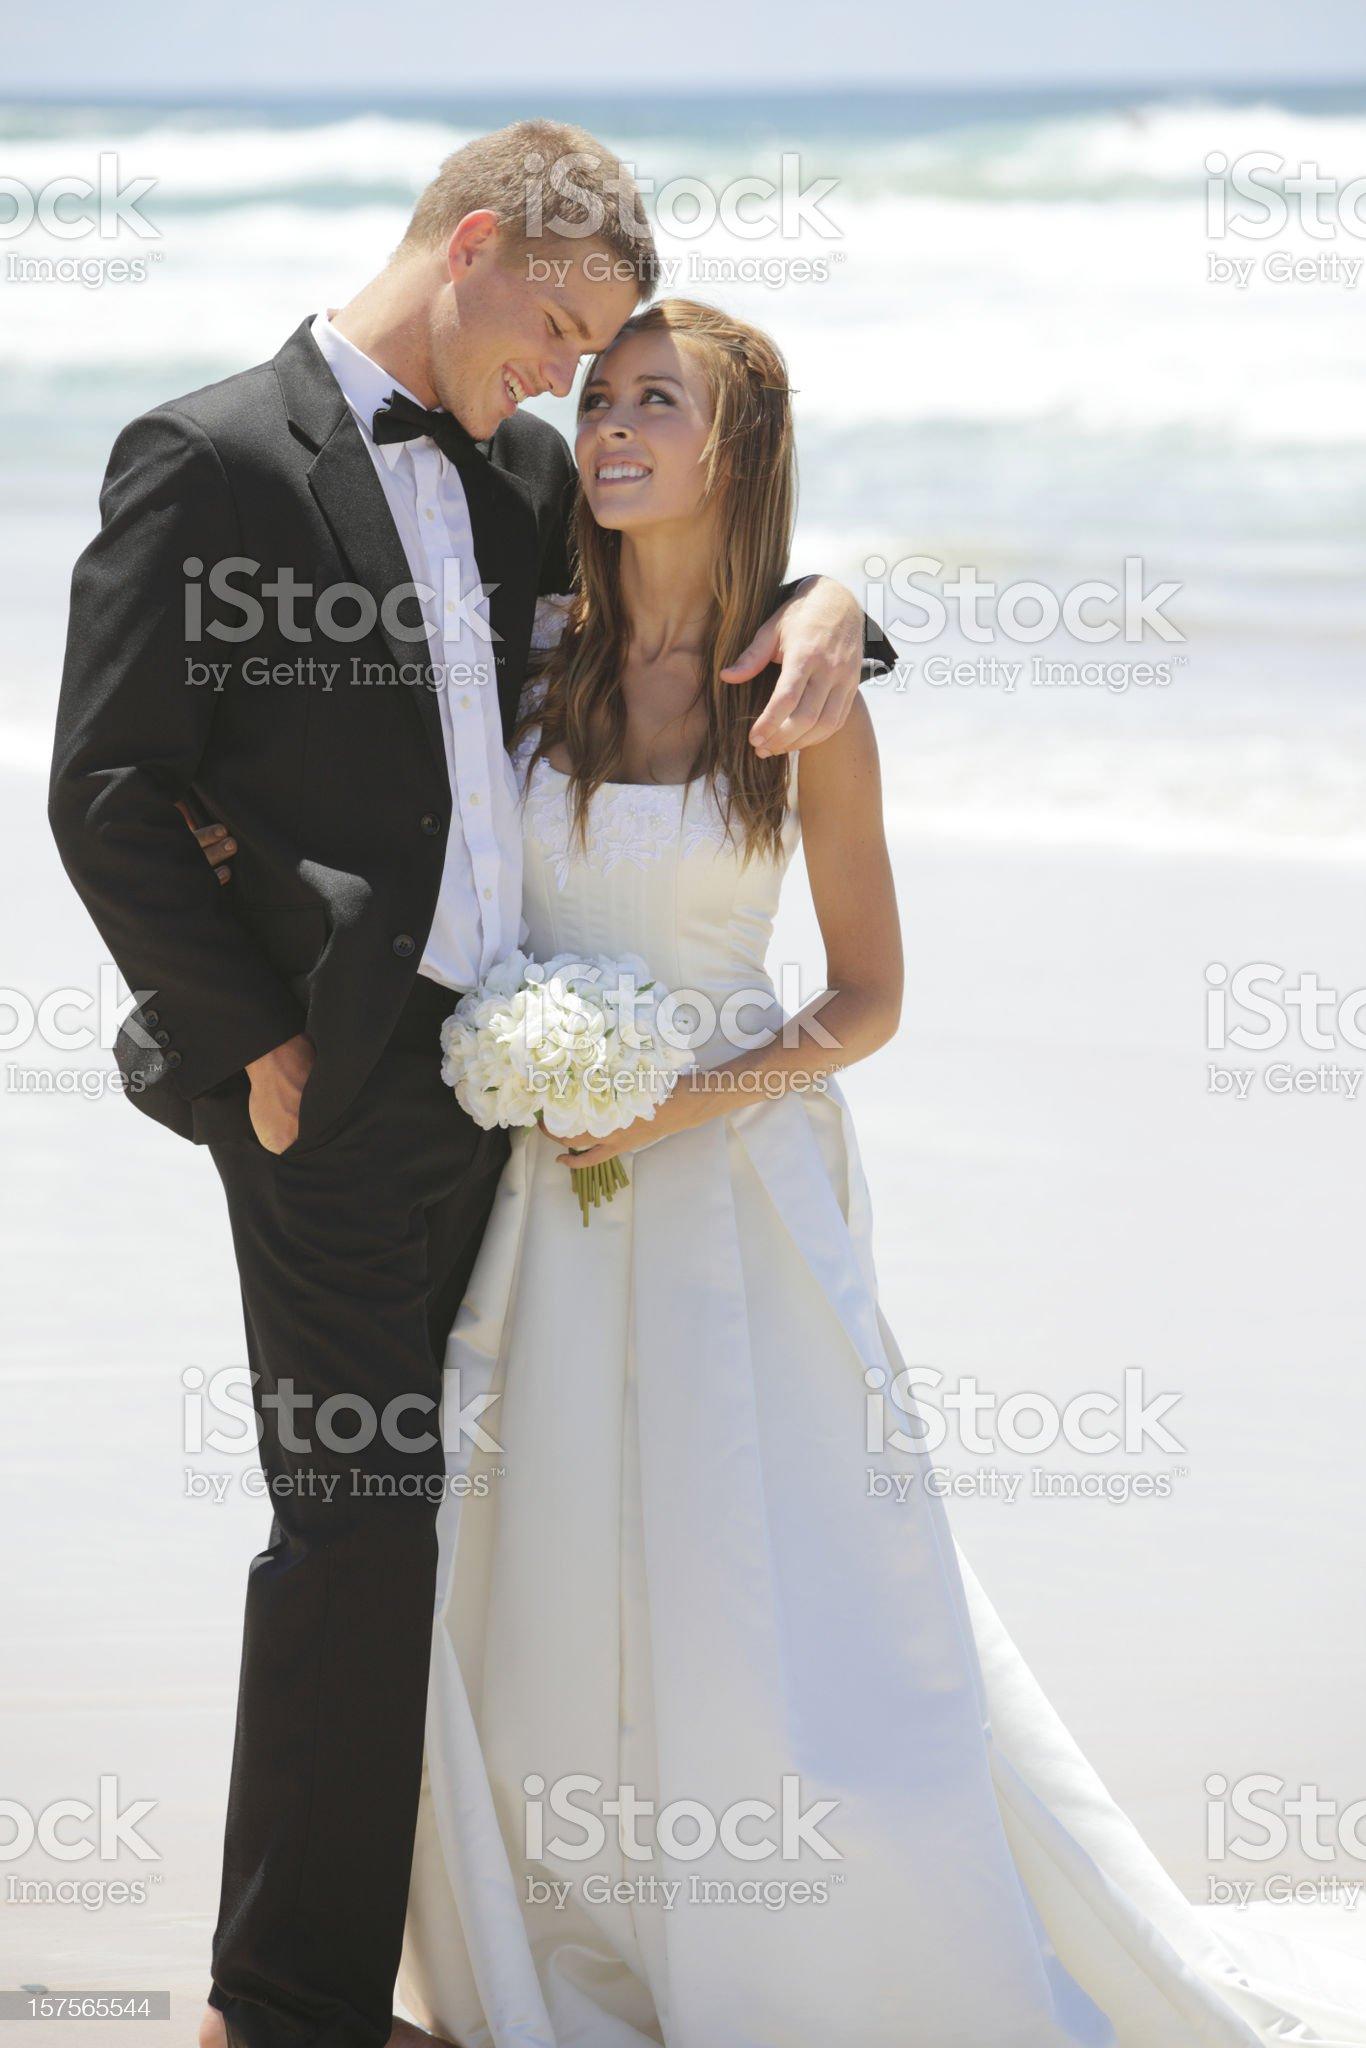 Beach Wedding Couple royalty-free stock photo